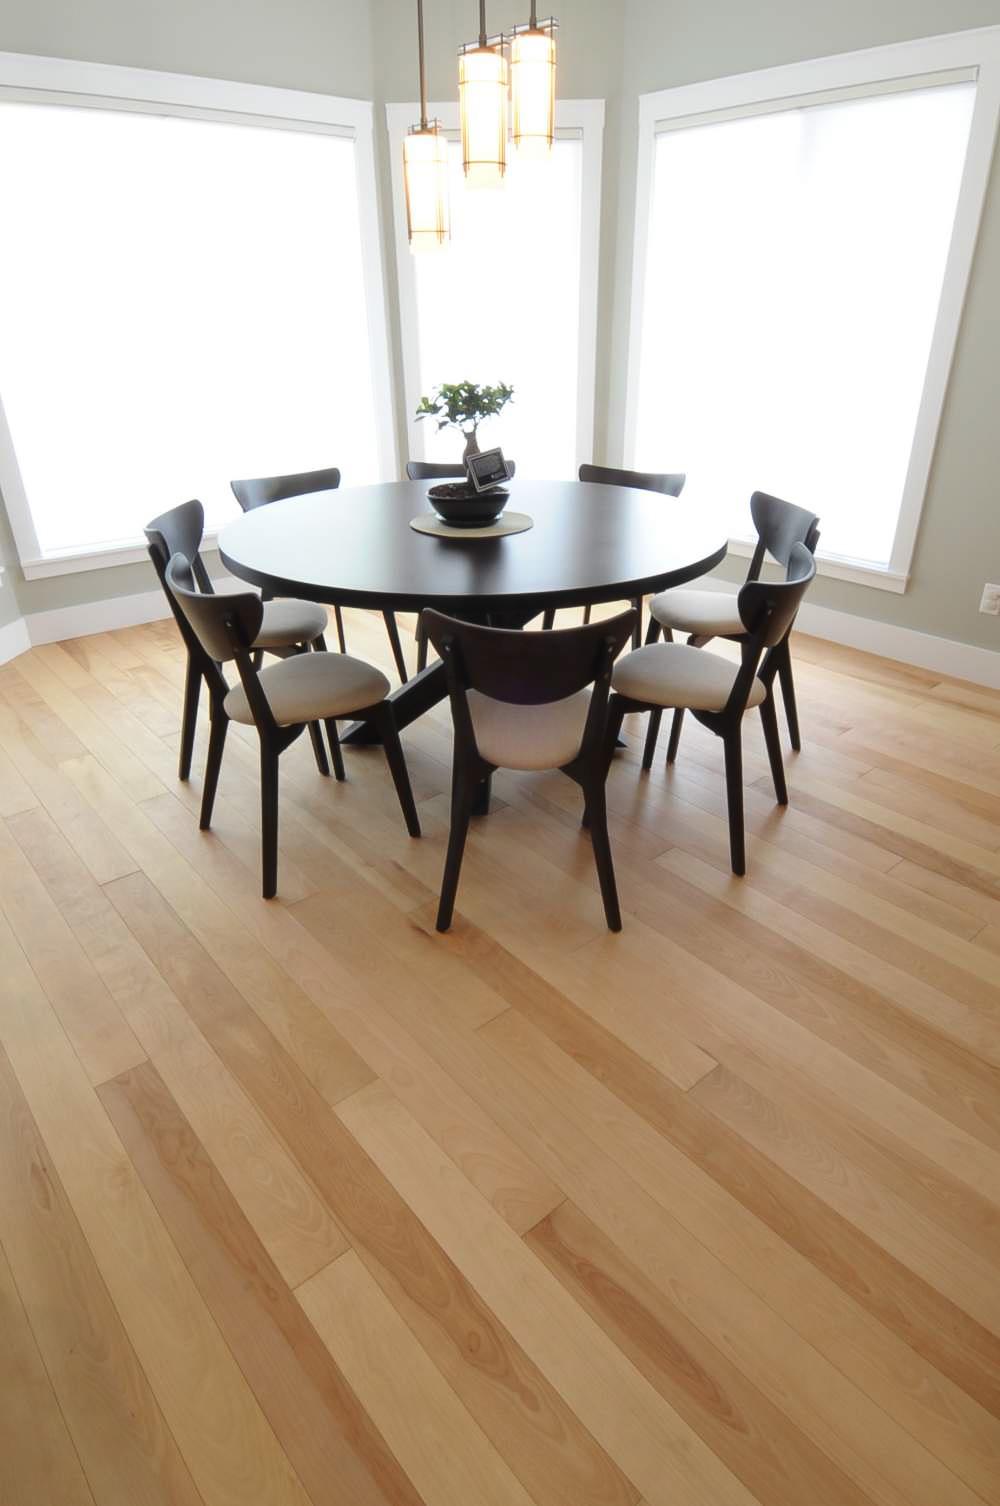 birch 5 inch plank flooring.jpg